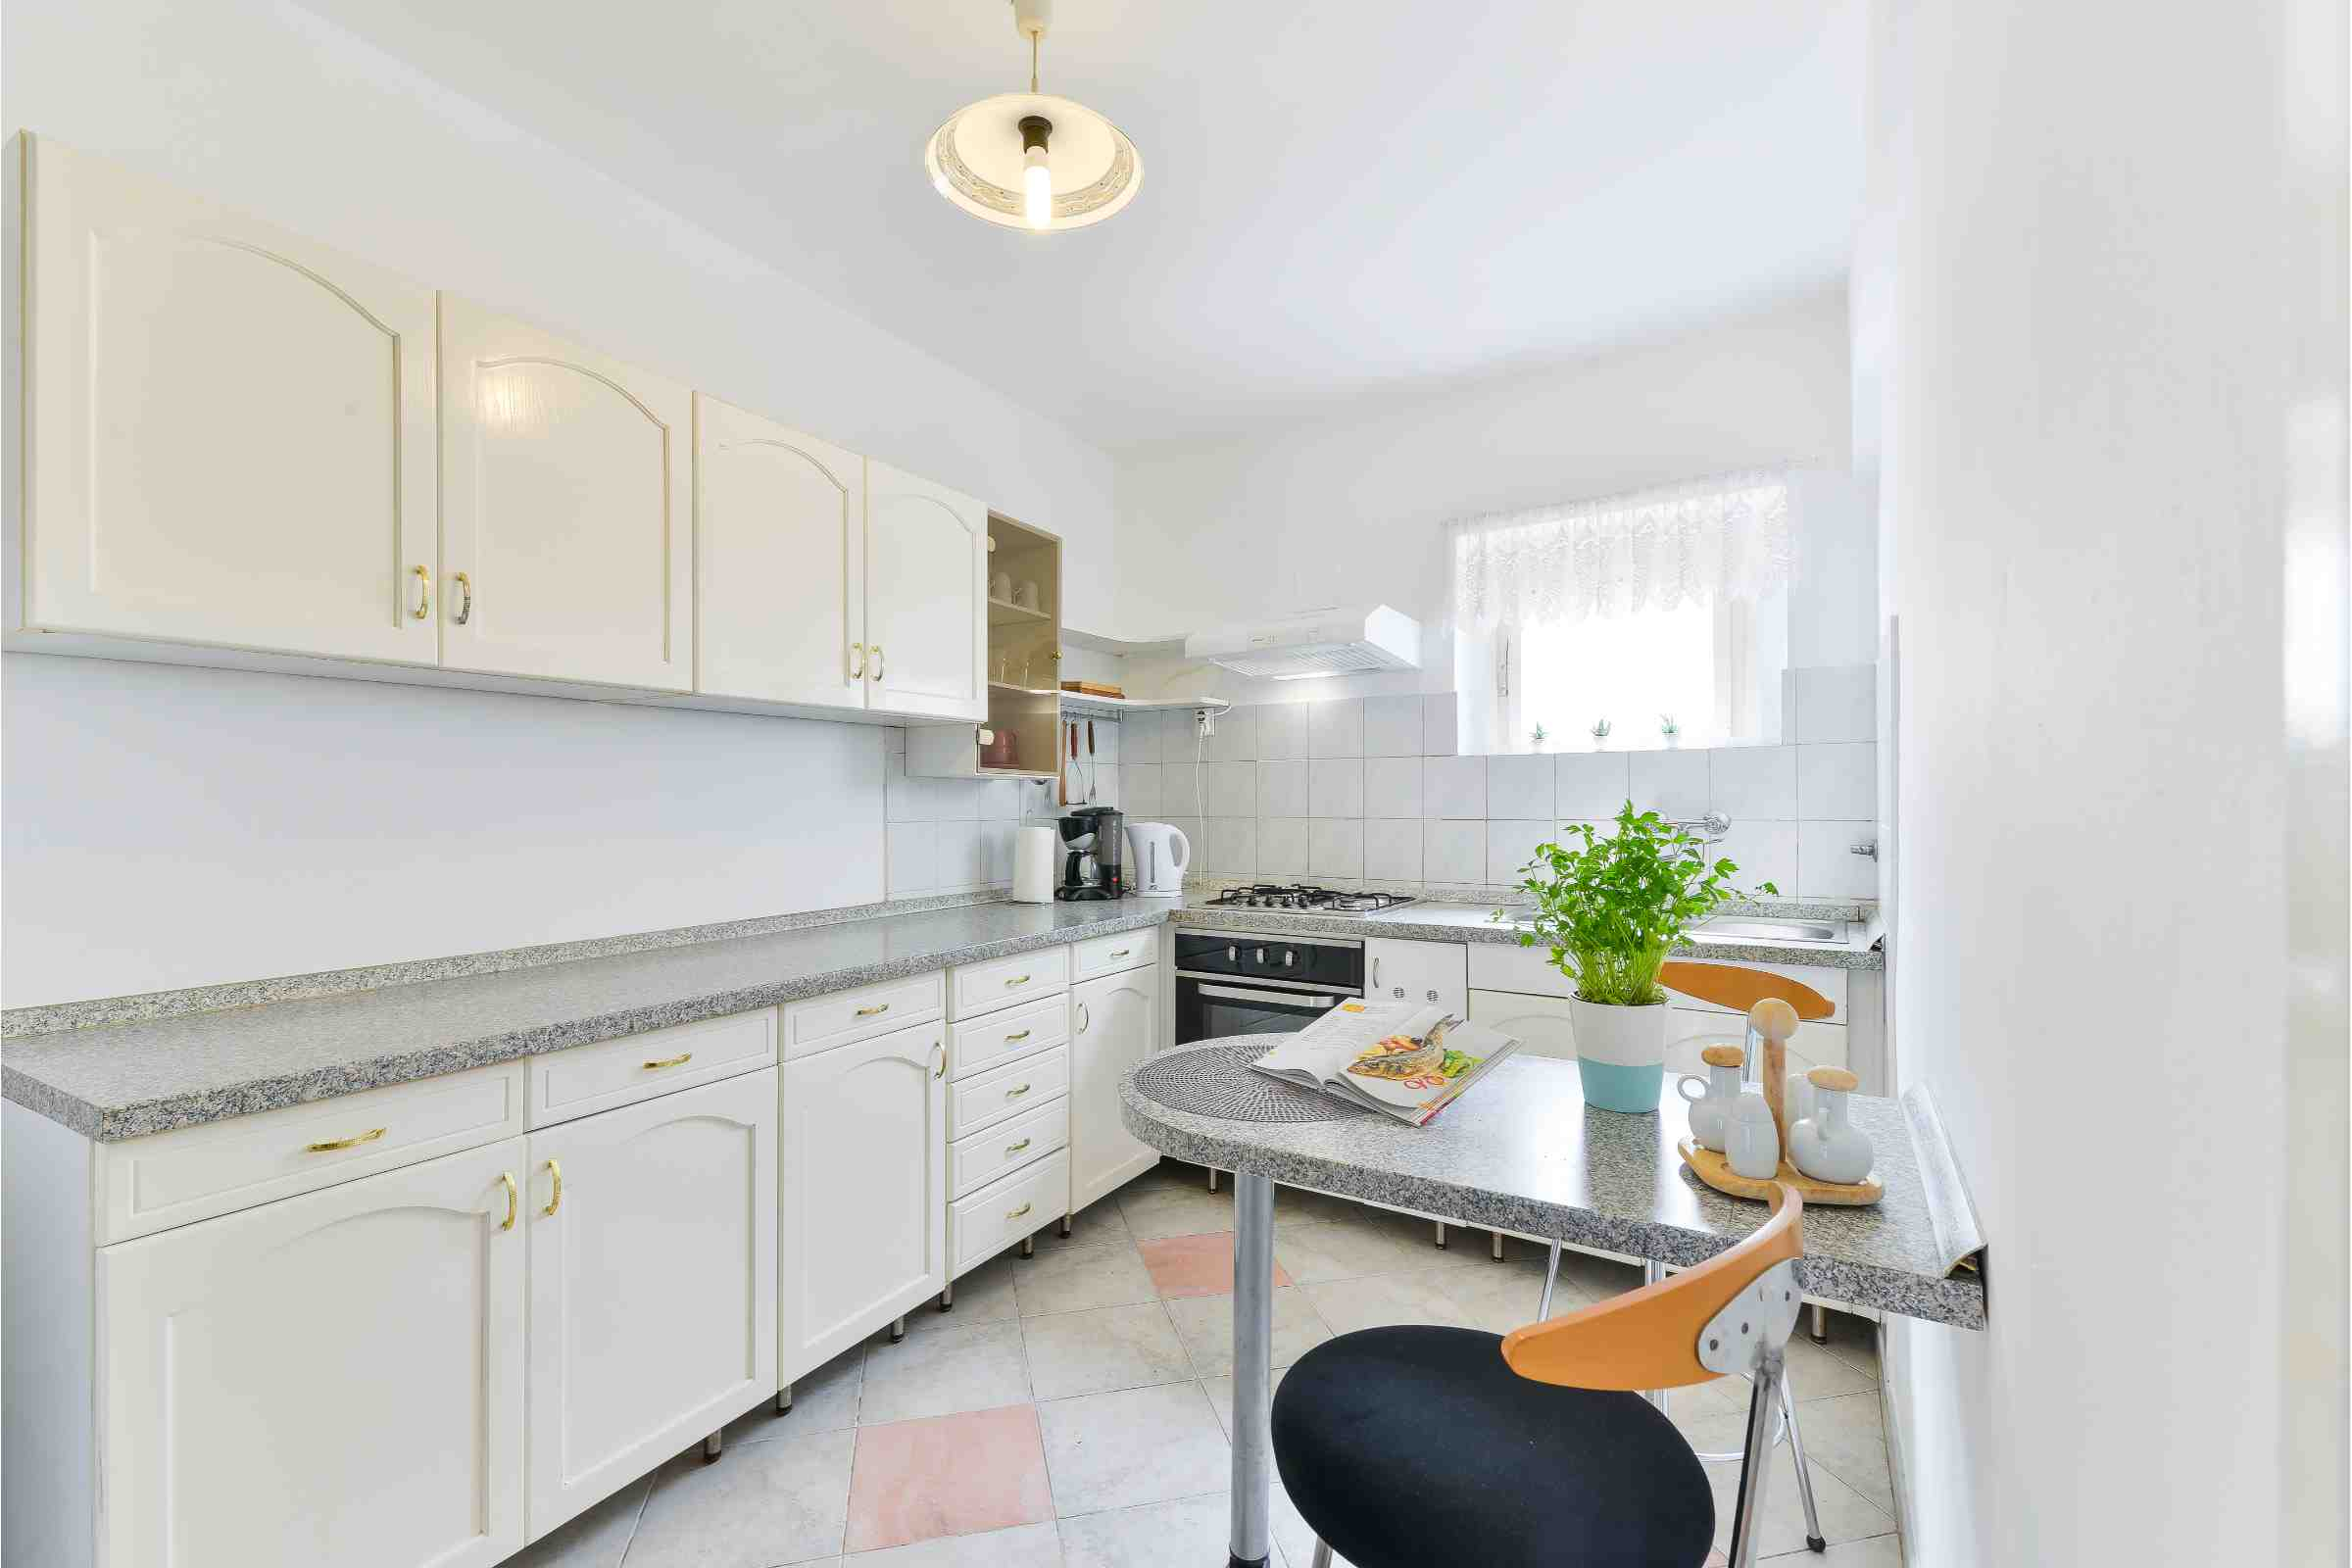 Apartamente Belladona 37647, Brodarica, Zadar, Rajoni i Zarës